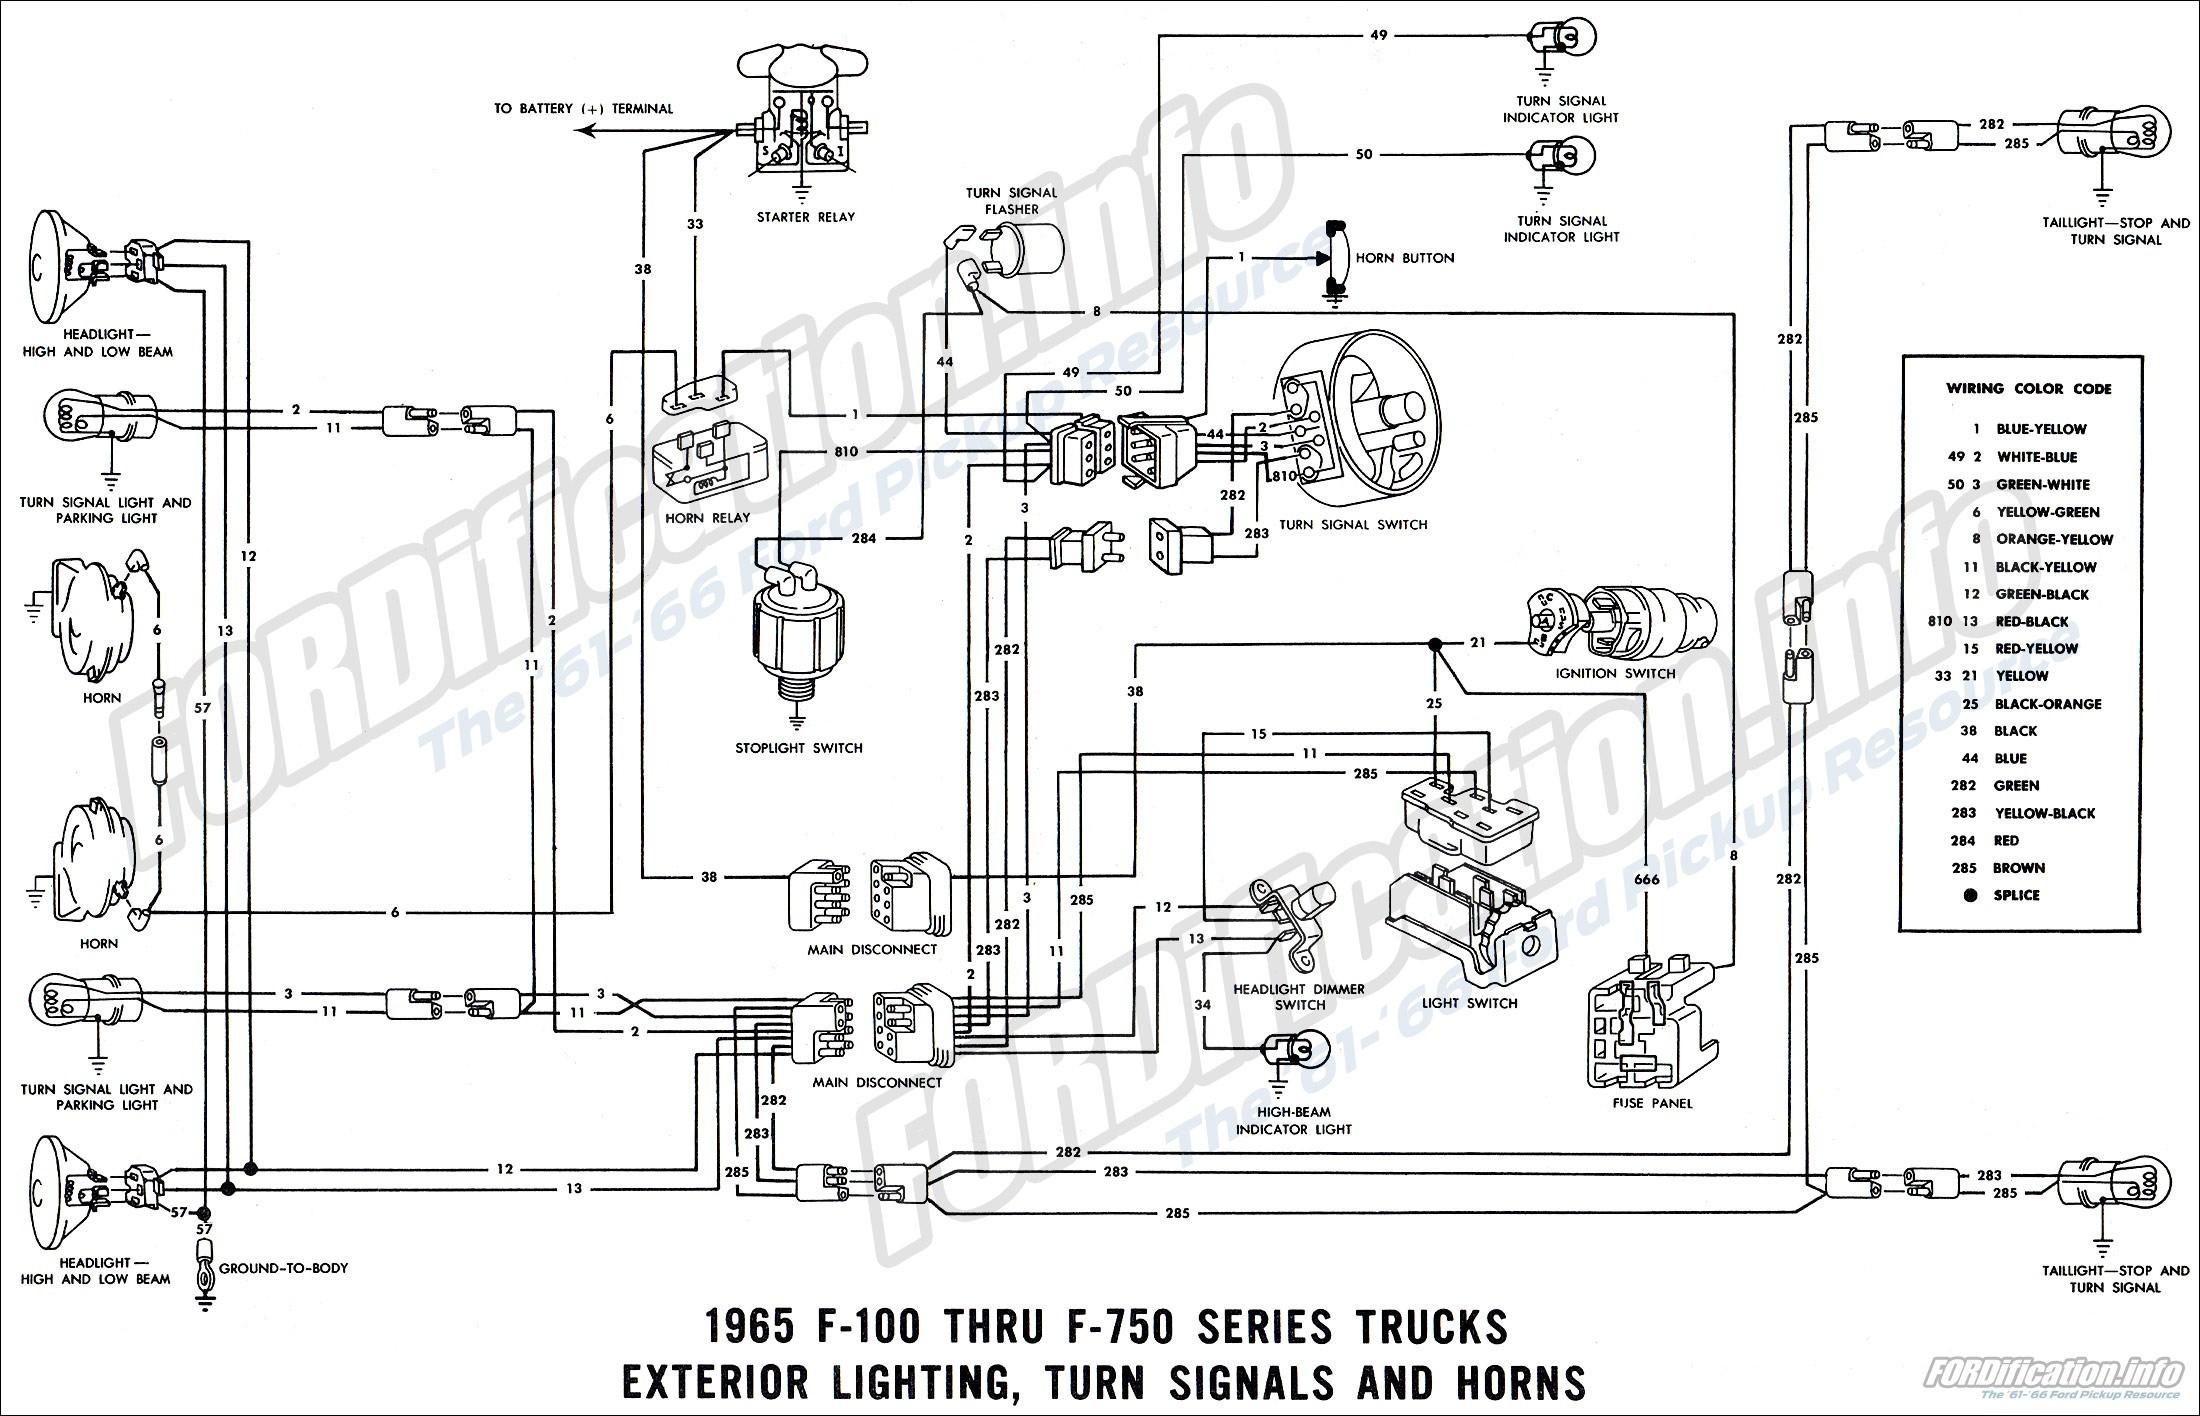 JPS 40] 40 Ford Wiring Diagram Turn Singles   boards demand ...